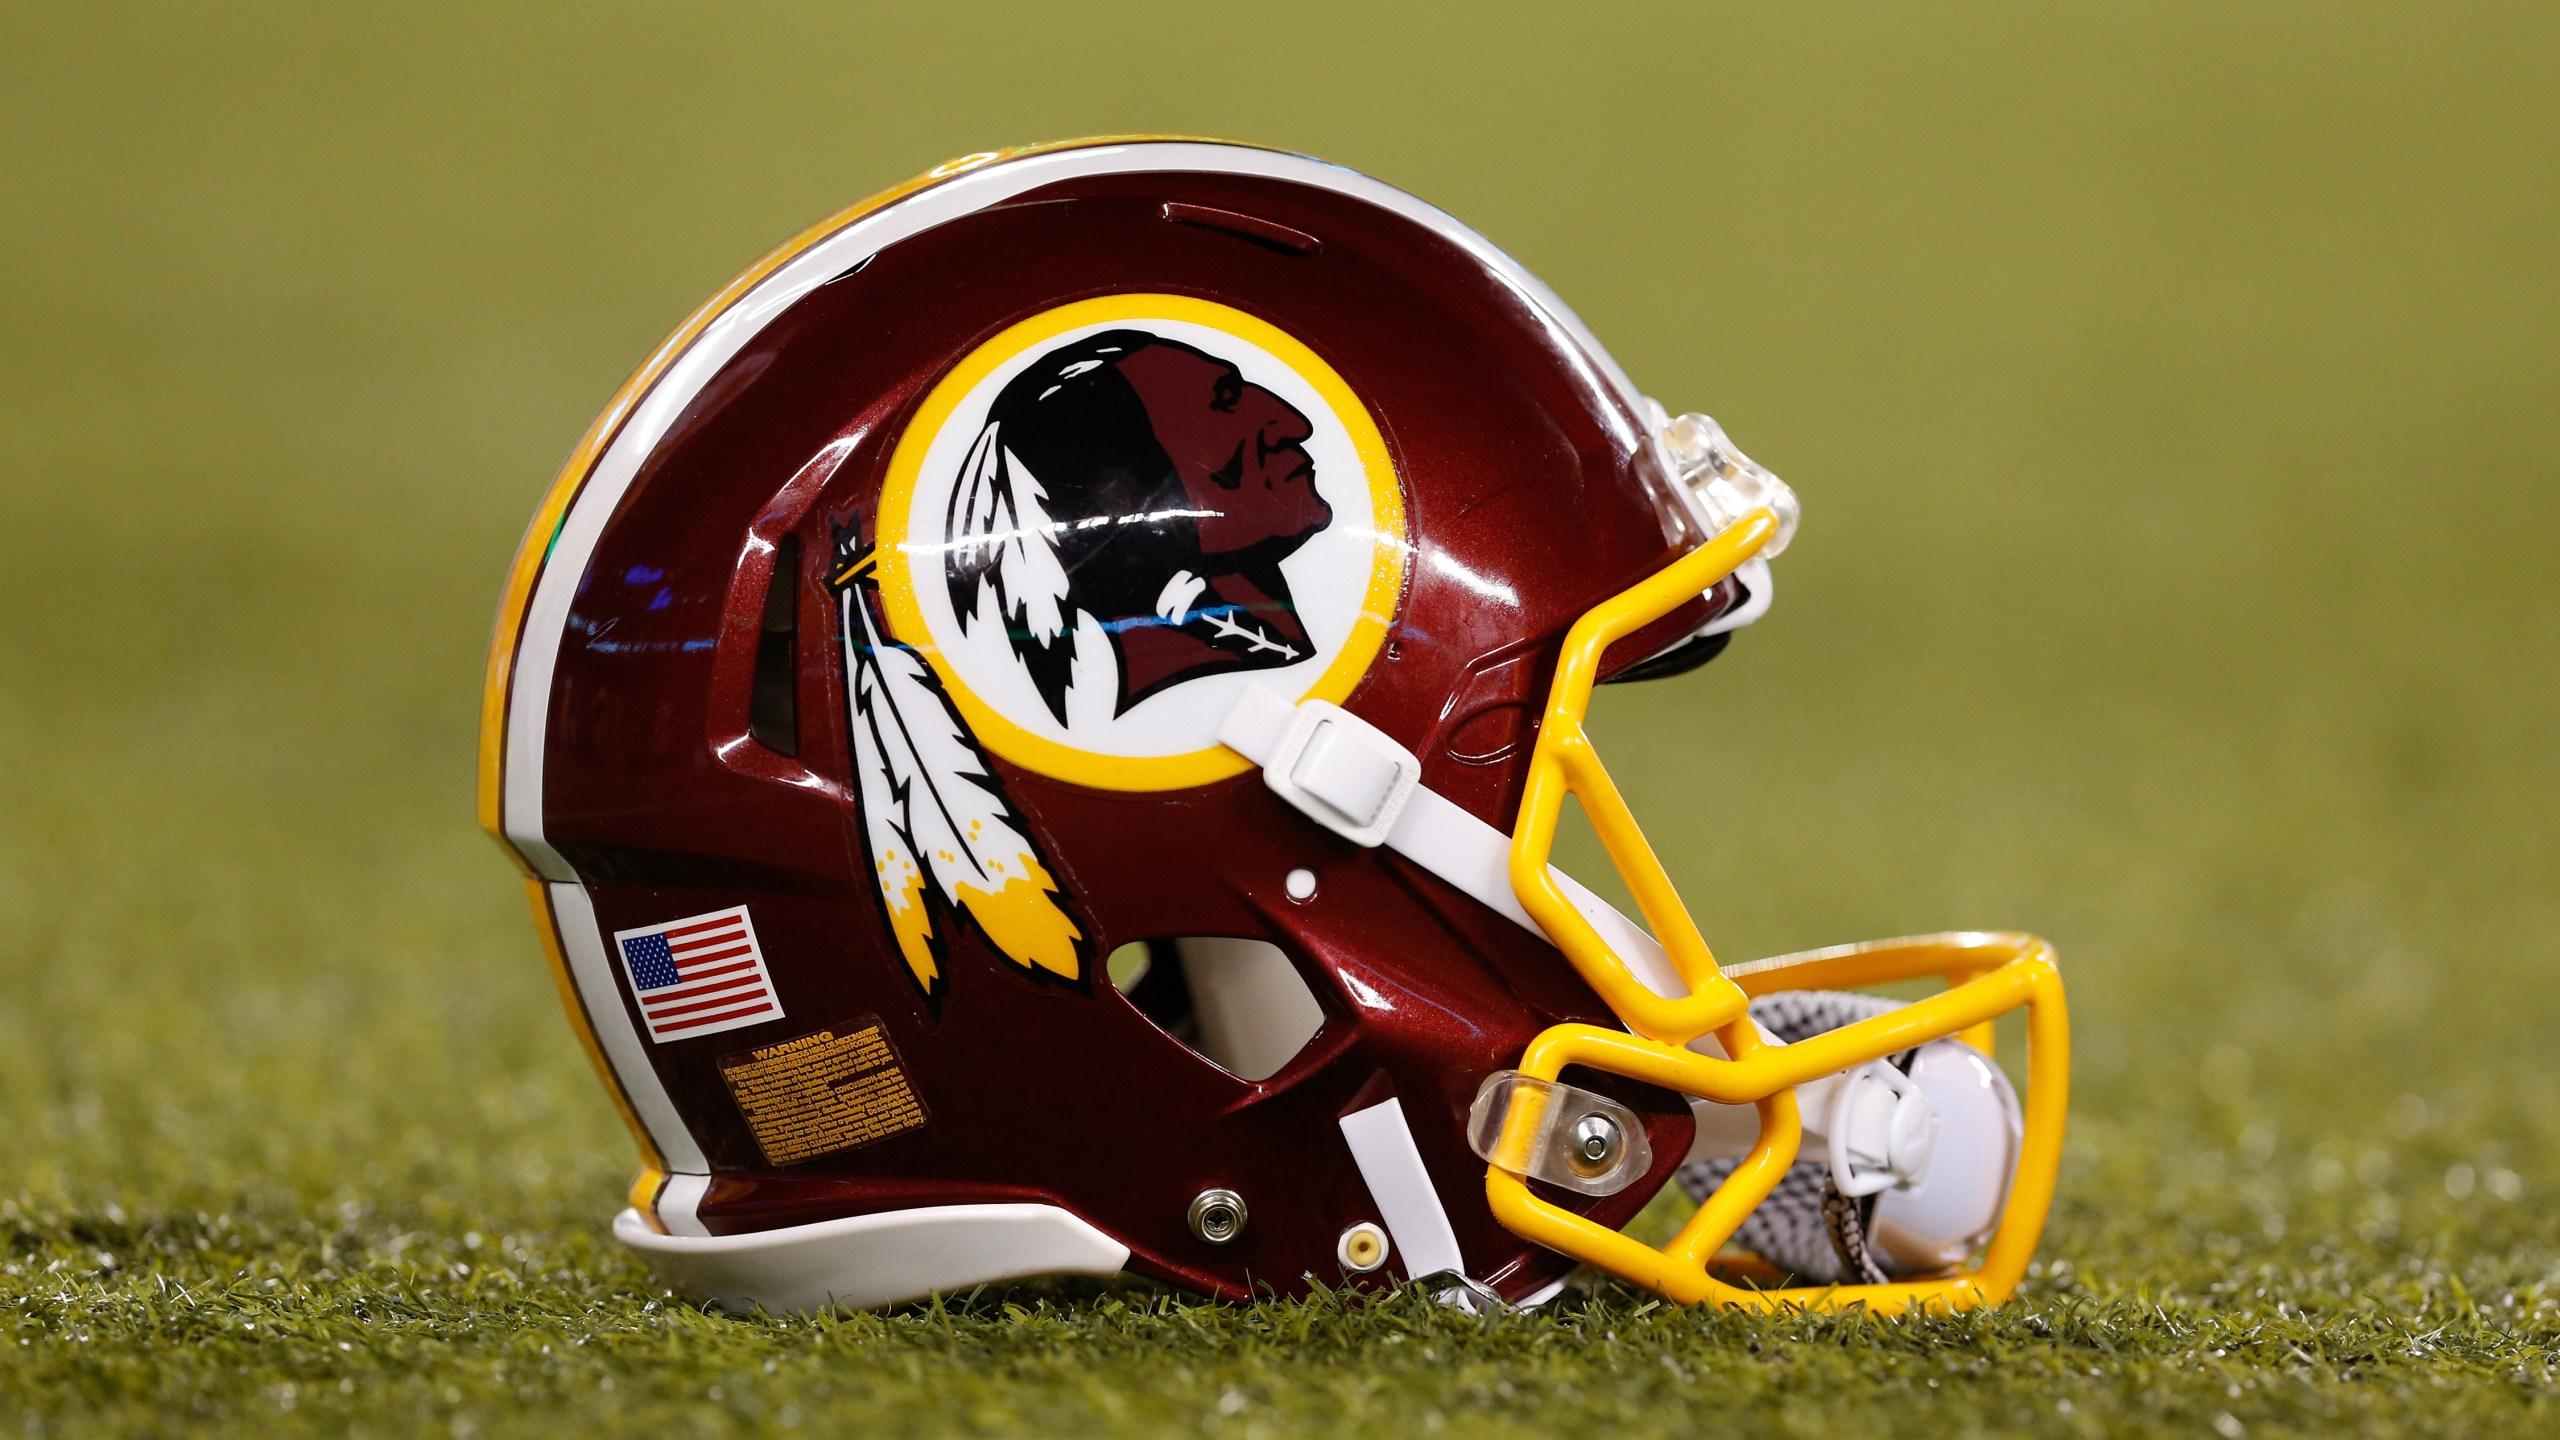 Redskins Giants Football_1538165959638